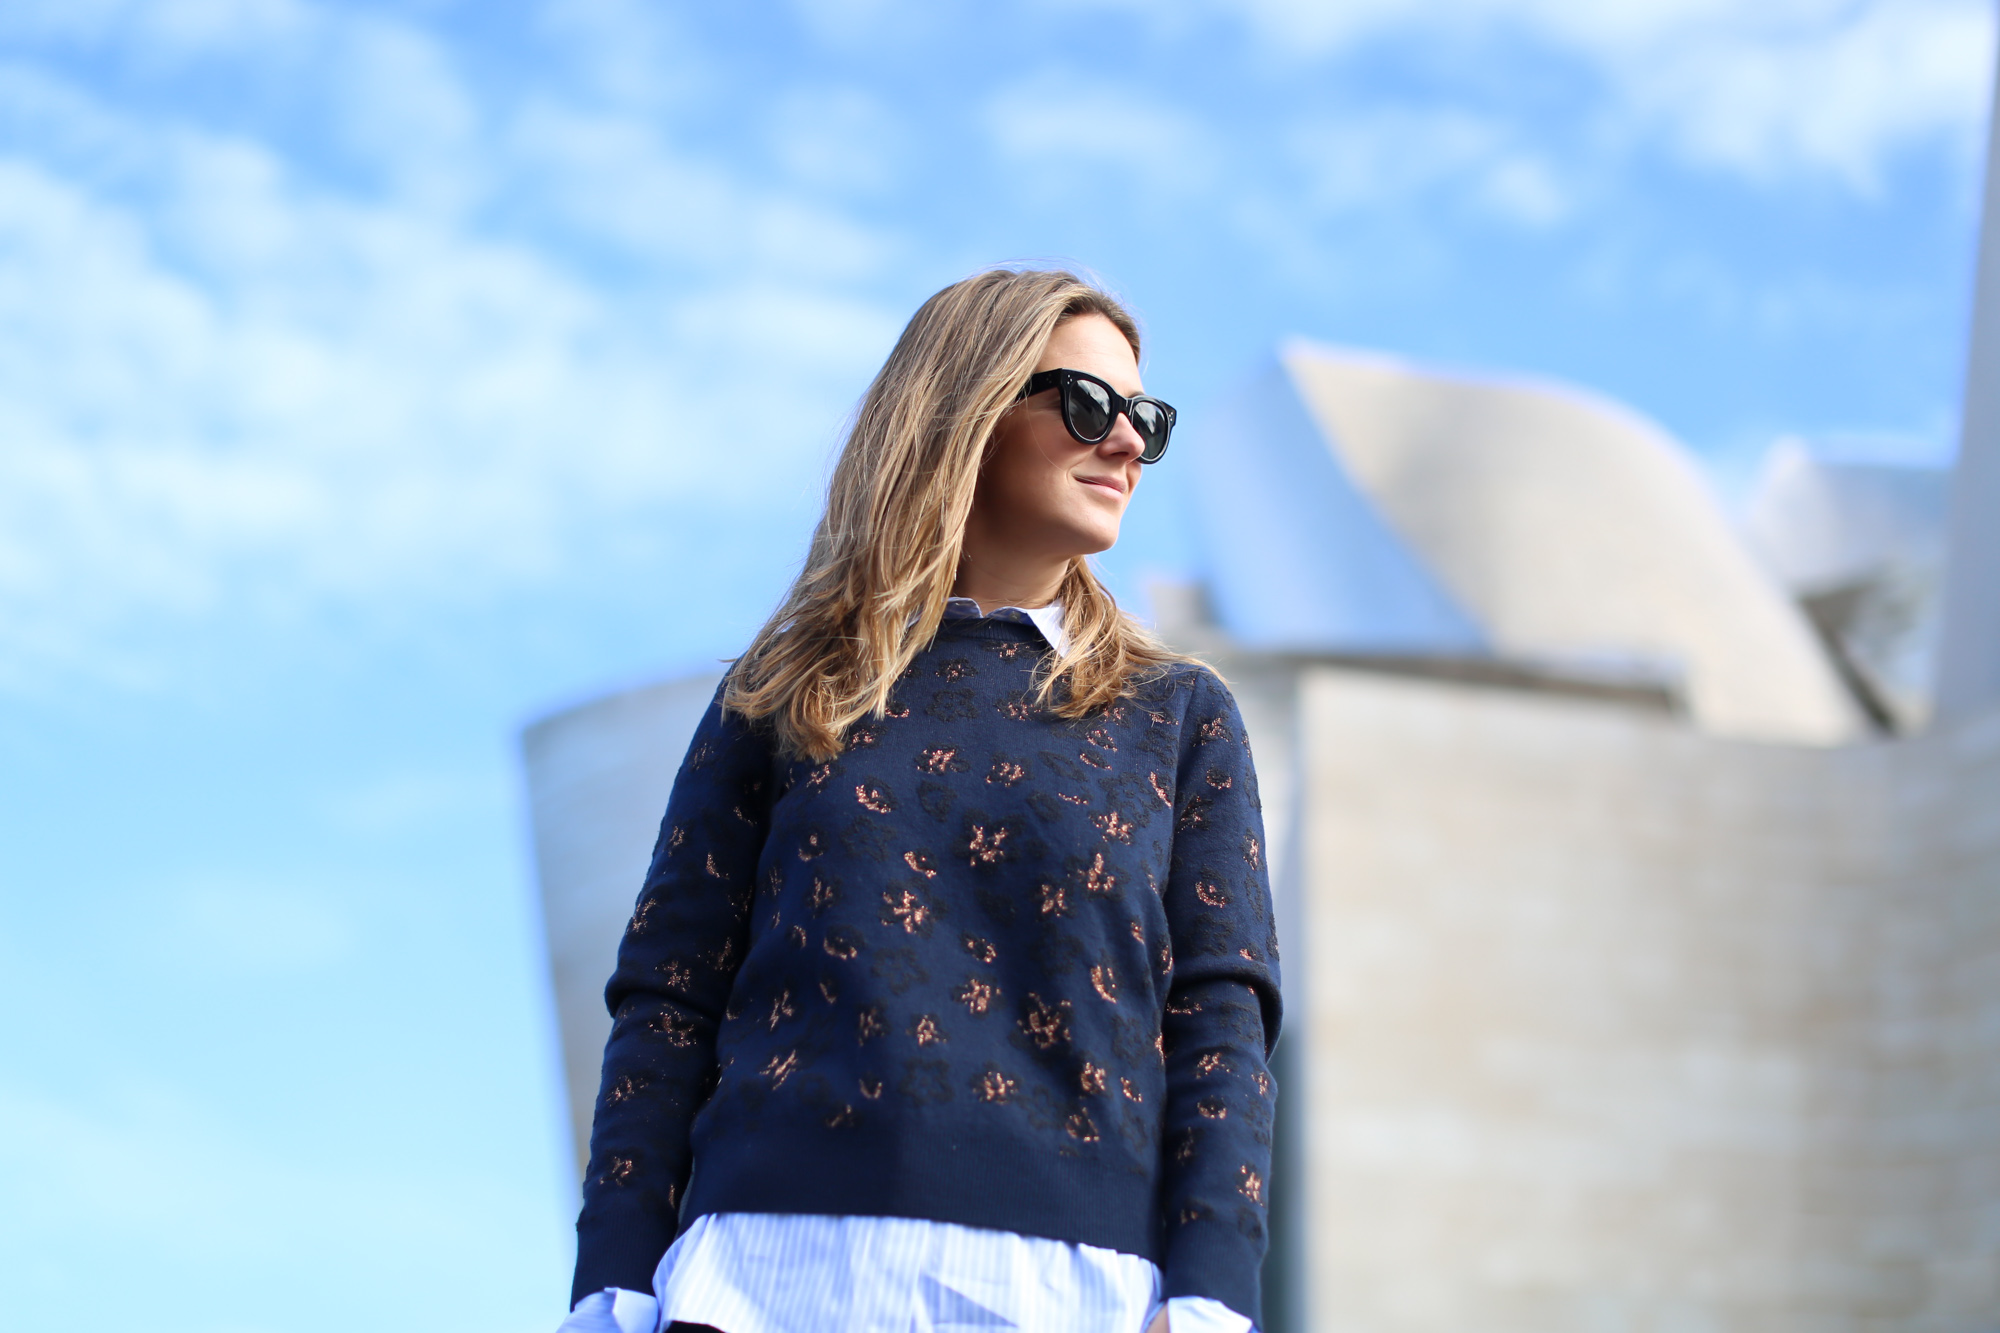 Clochet_streetstyle_fashionblogger_andotherstoriesbeigelongwoolcoat_&otherstoriessuedeankleboots-6